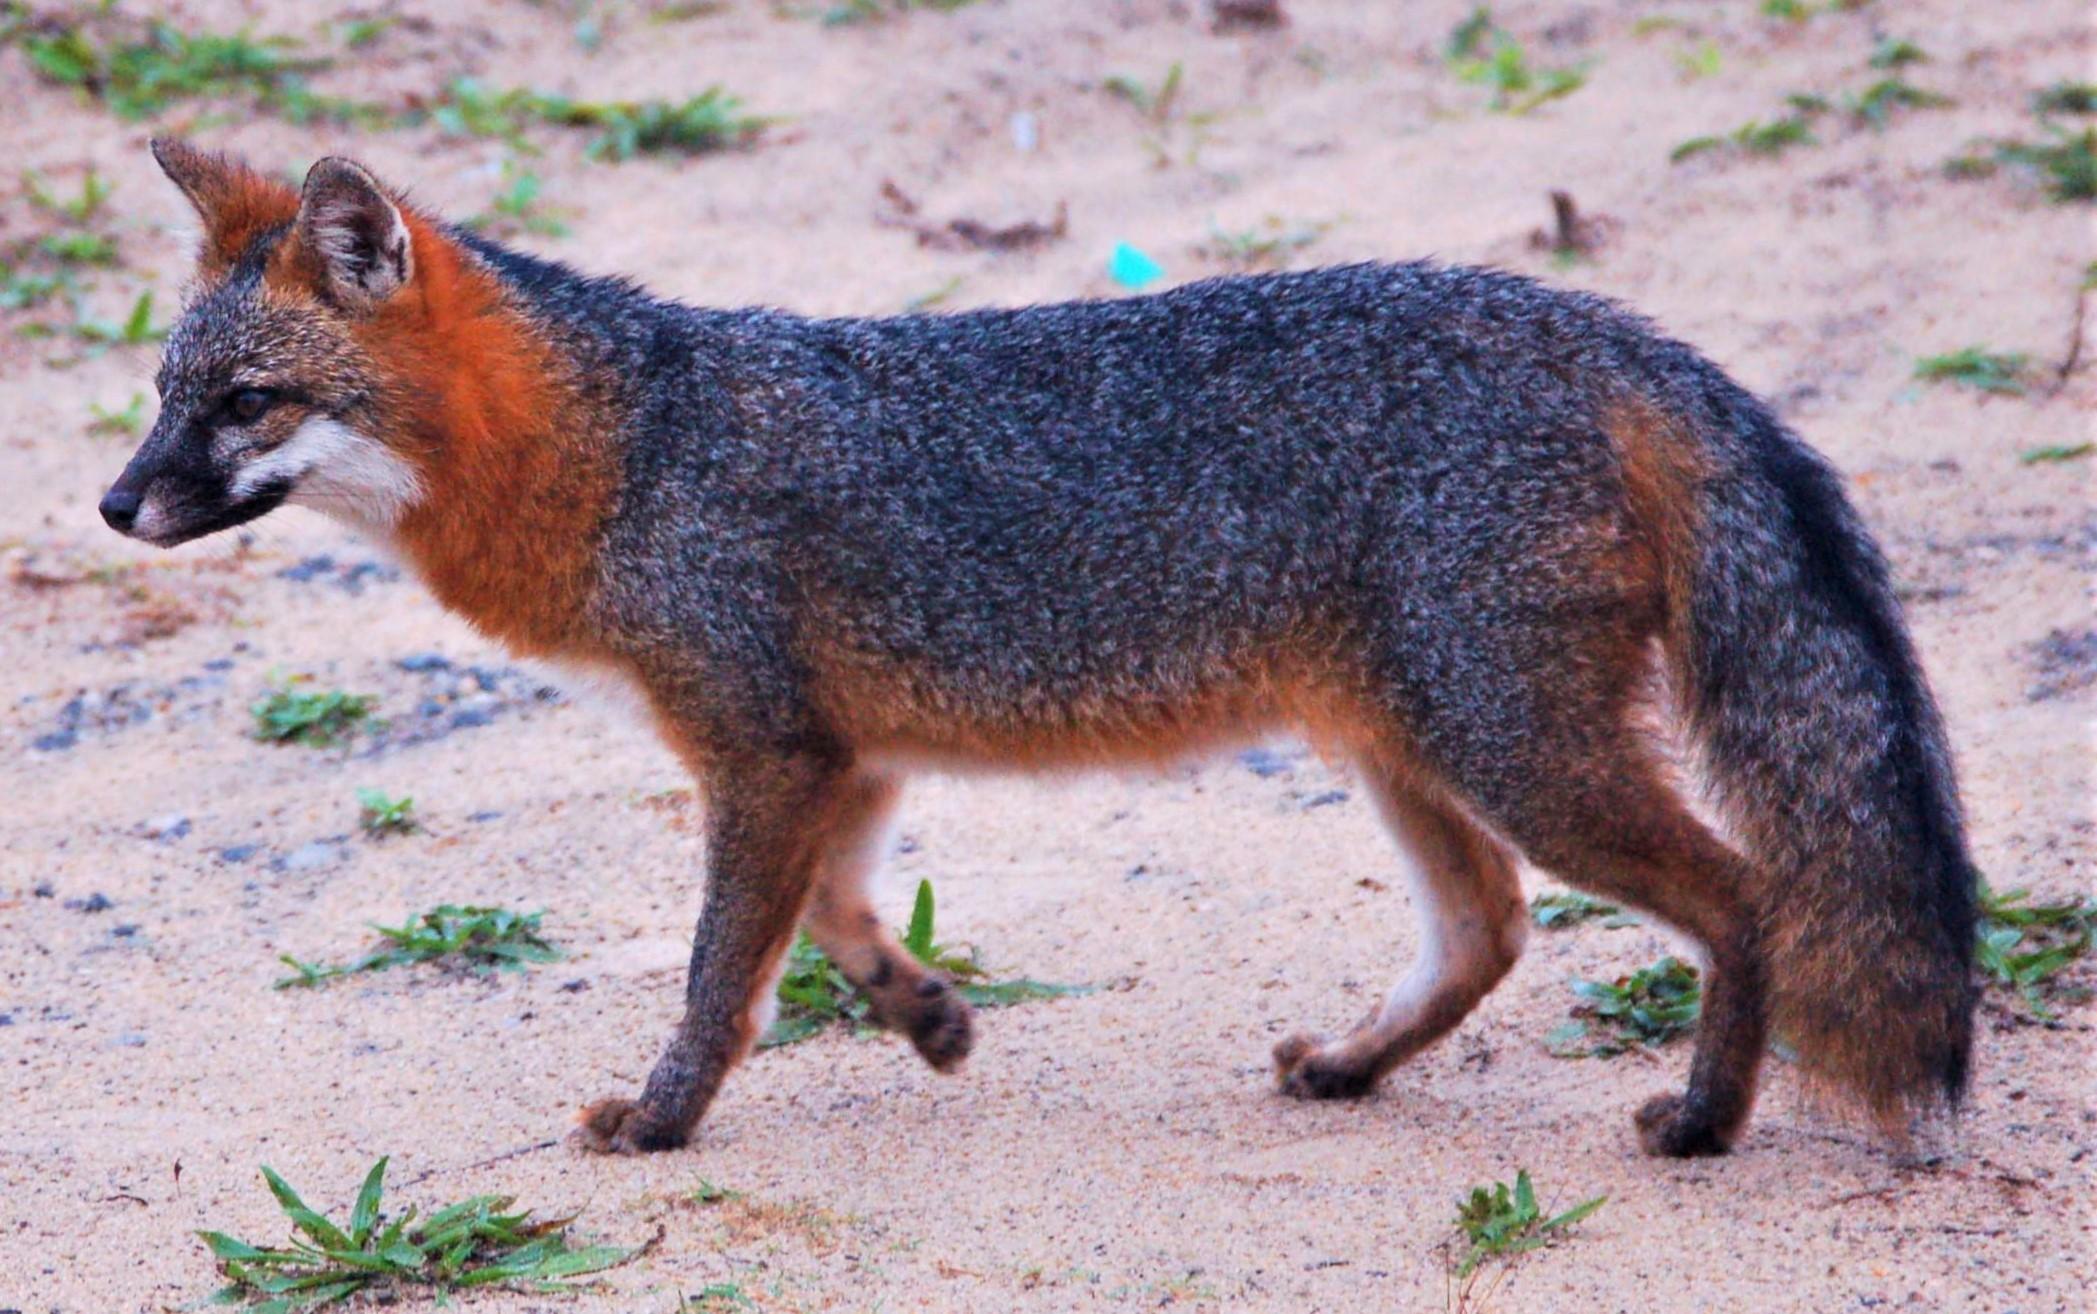 Image of gray fox walking in desert habitat